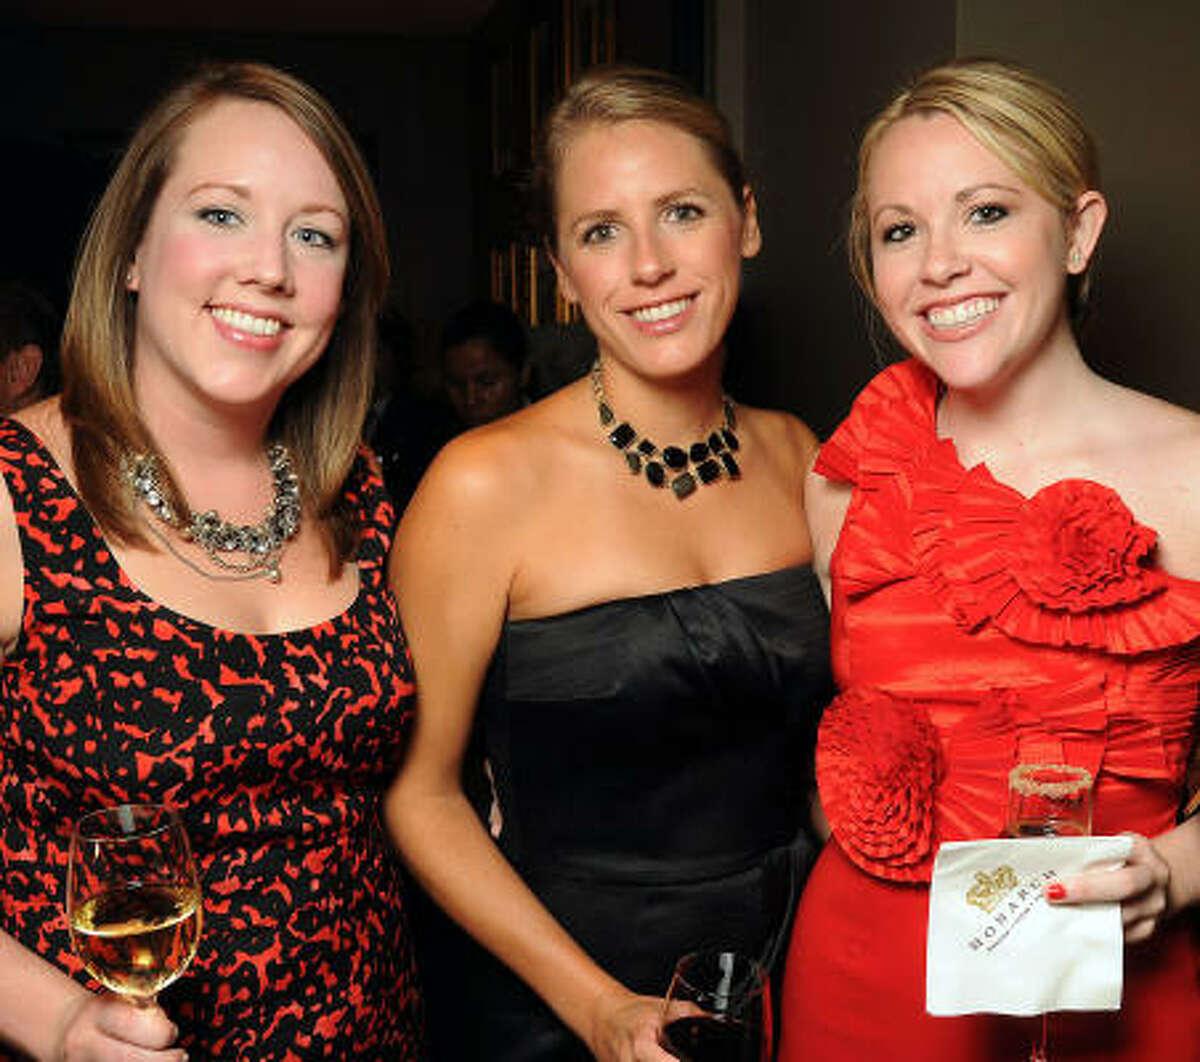 From left: Lindsay Johnson, Cynthia Frawley and Victoria Beard